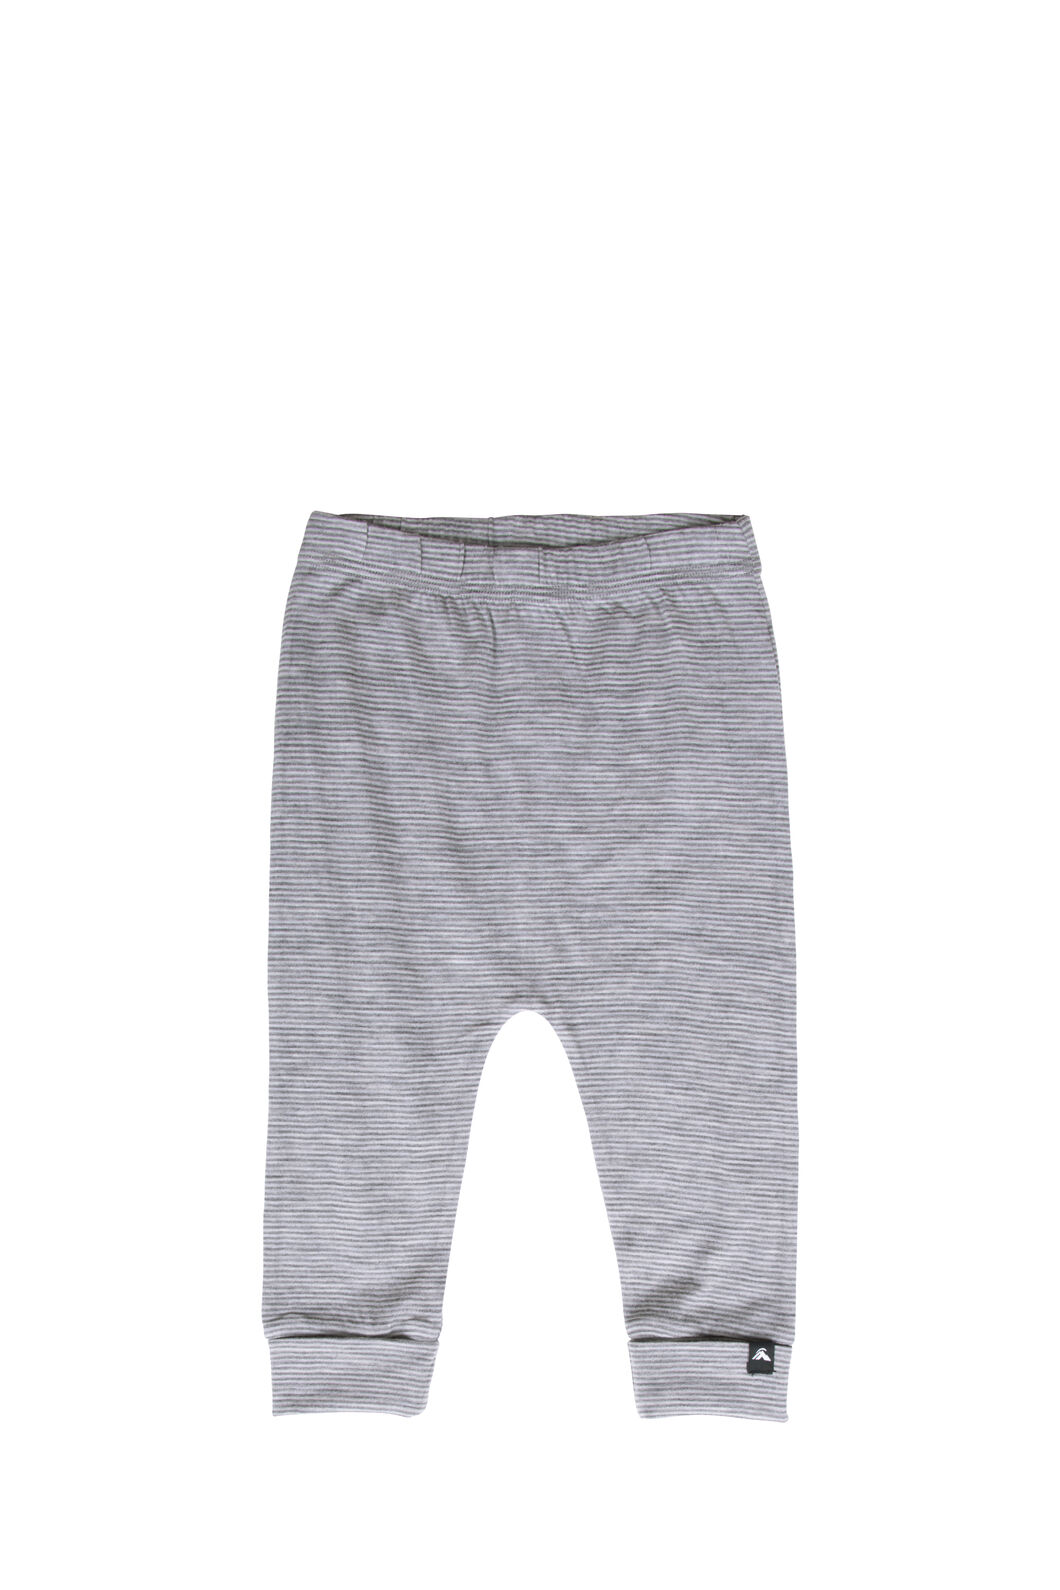 Macpac 150 Merino Long Johns — Baby, Light Grey Stripe, hi-res